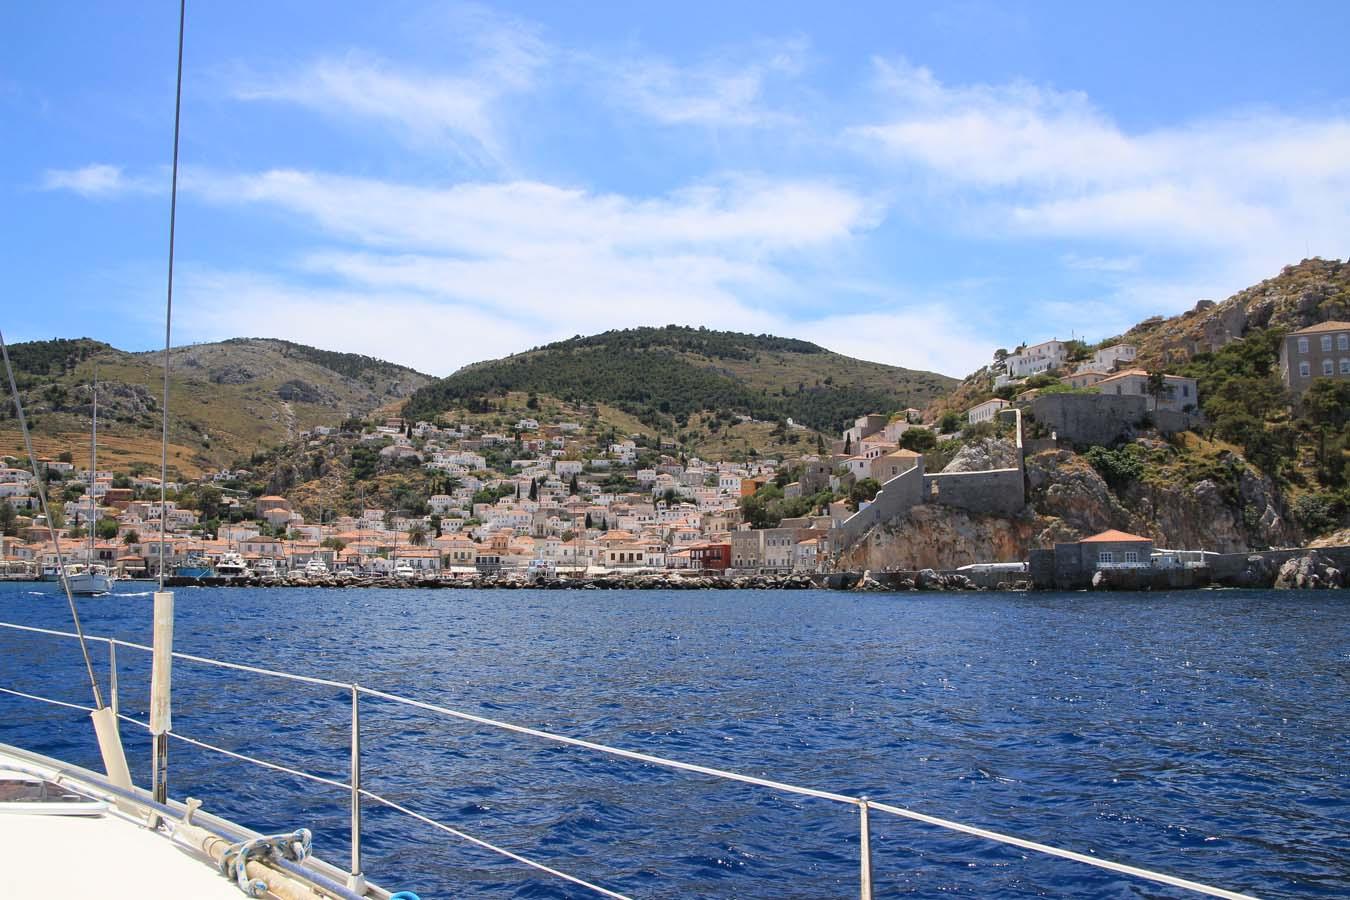 Sailing in Greece. Entering Hydra.